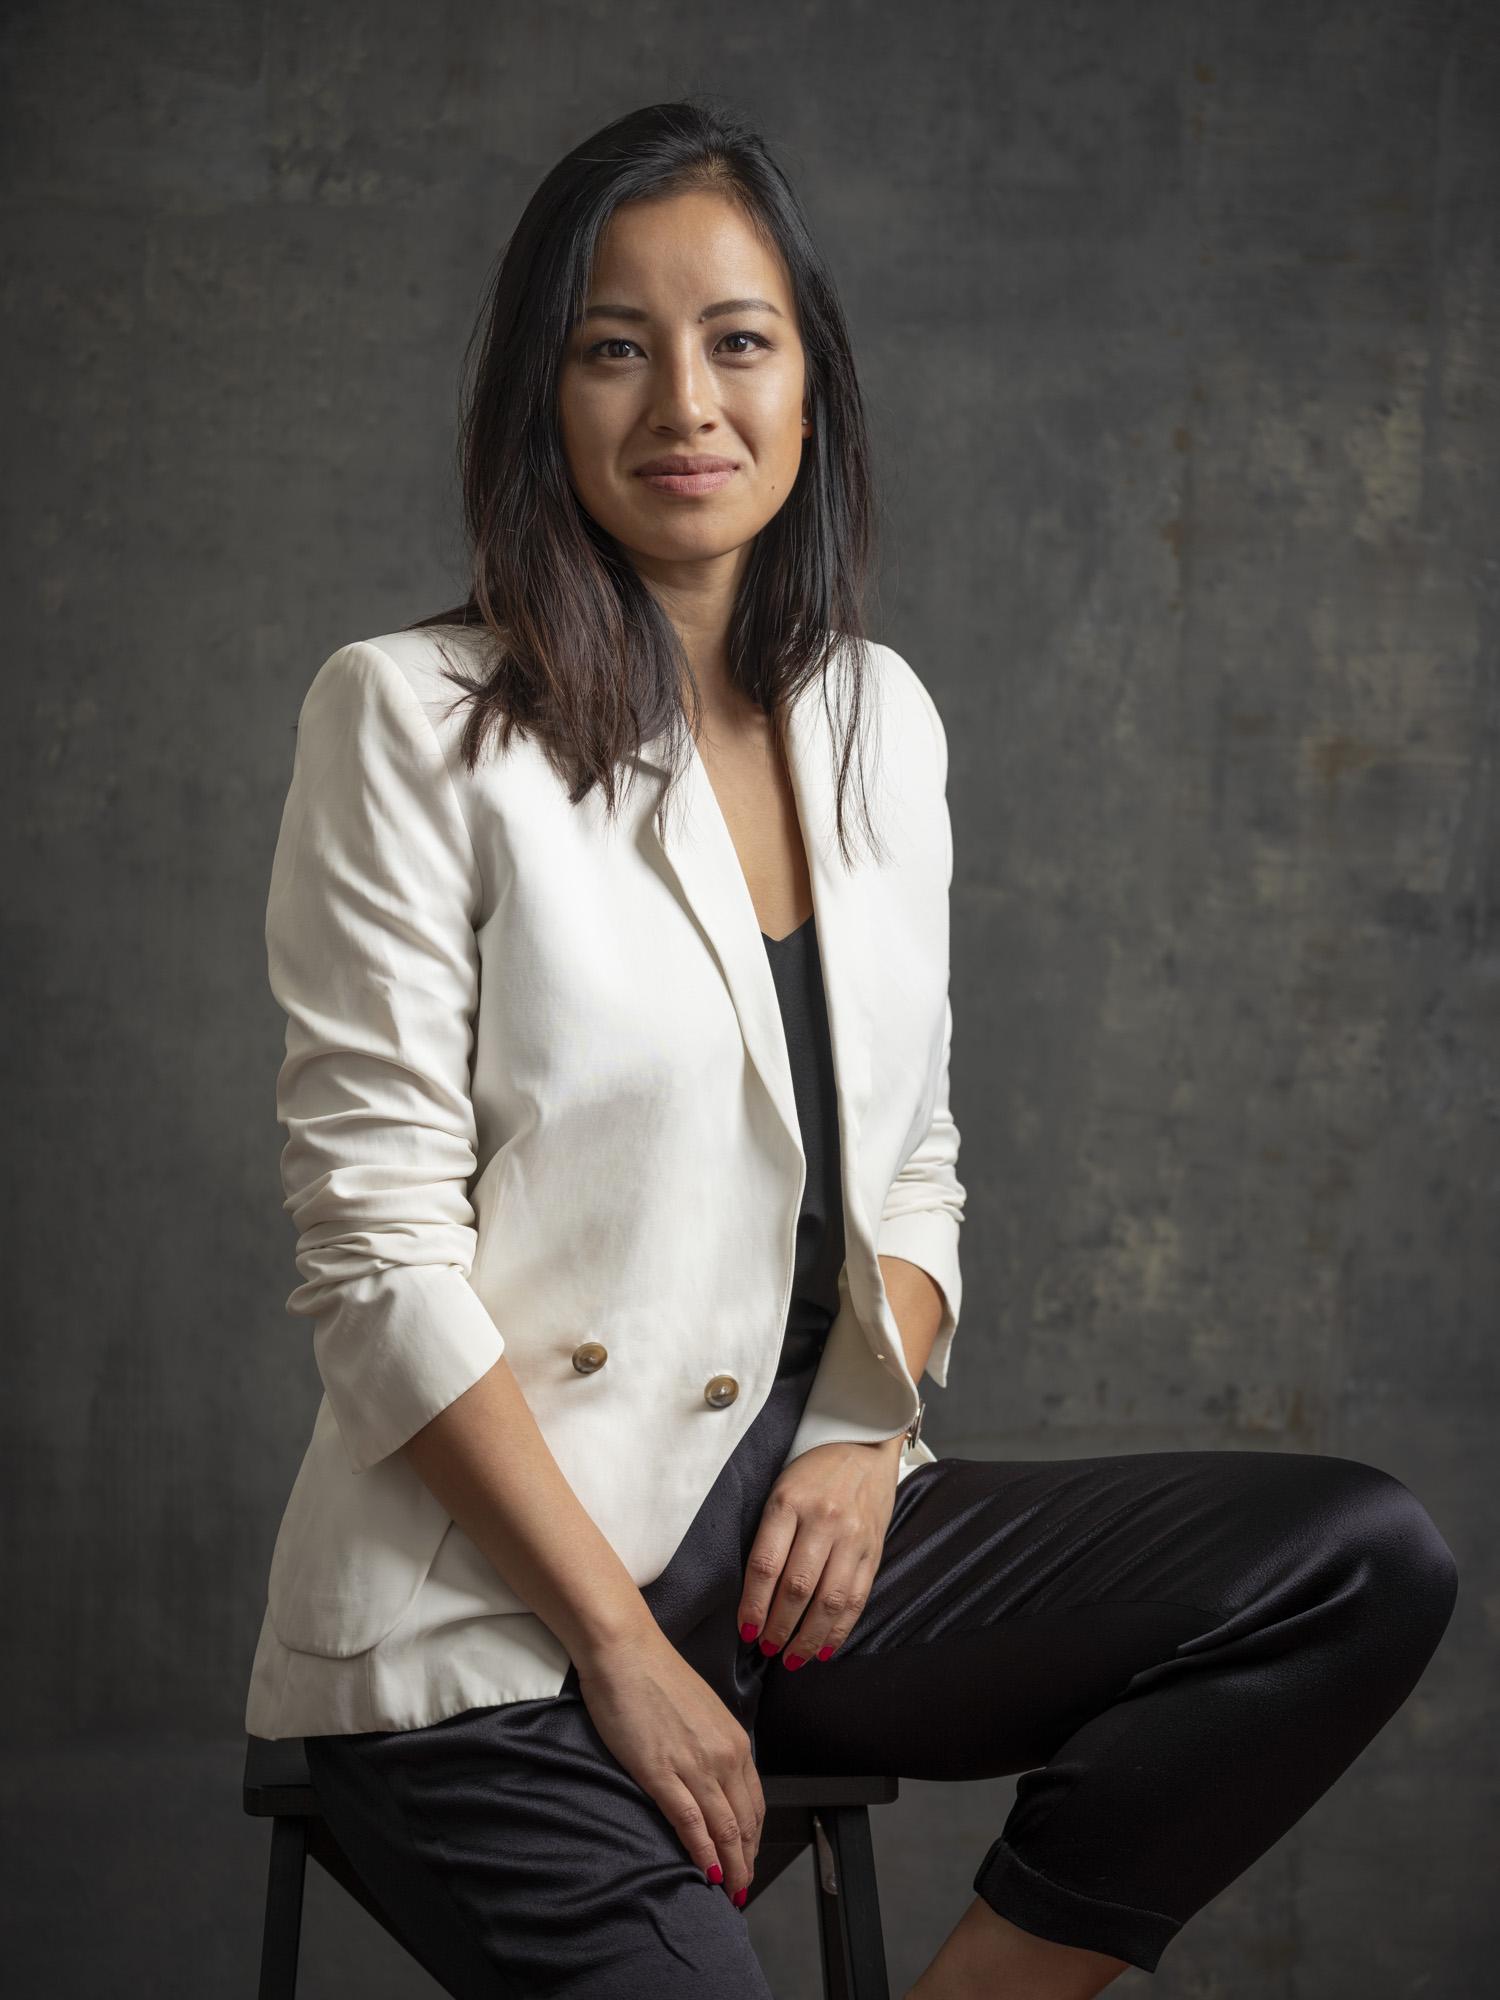 Corporate headshot portrait linkedin profil photography studio singapore services asia photographer white jacket